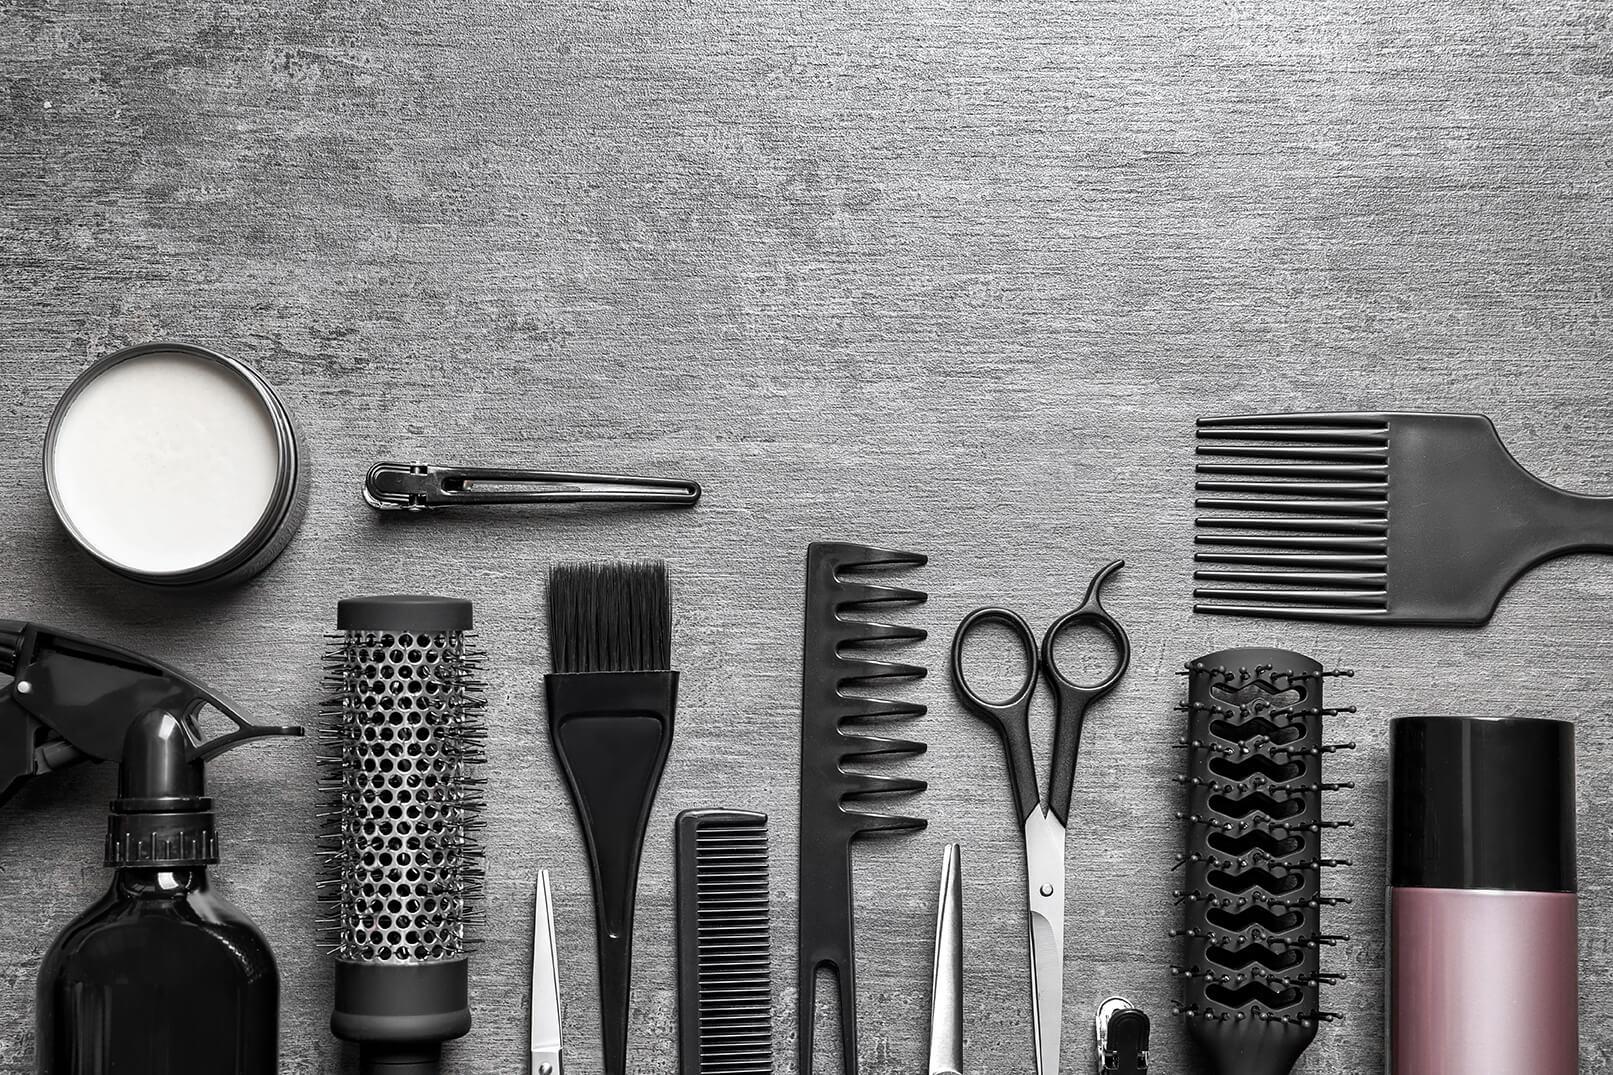 Professoinal hair salon services